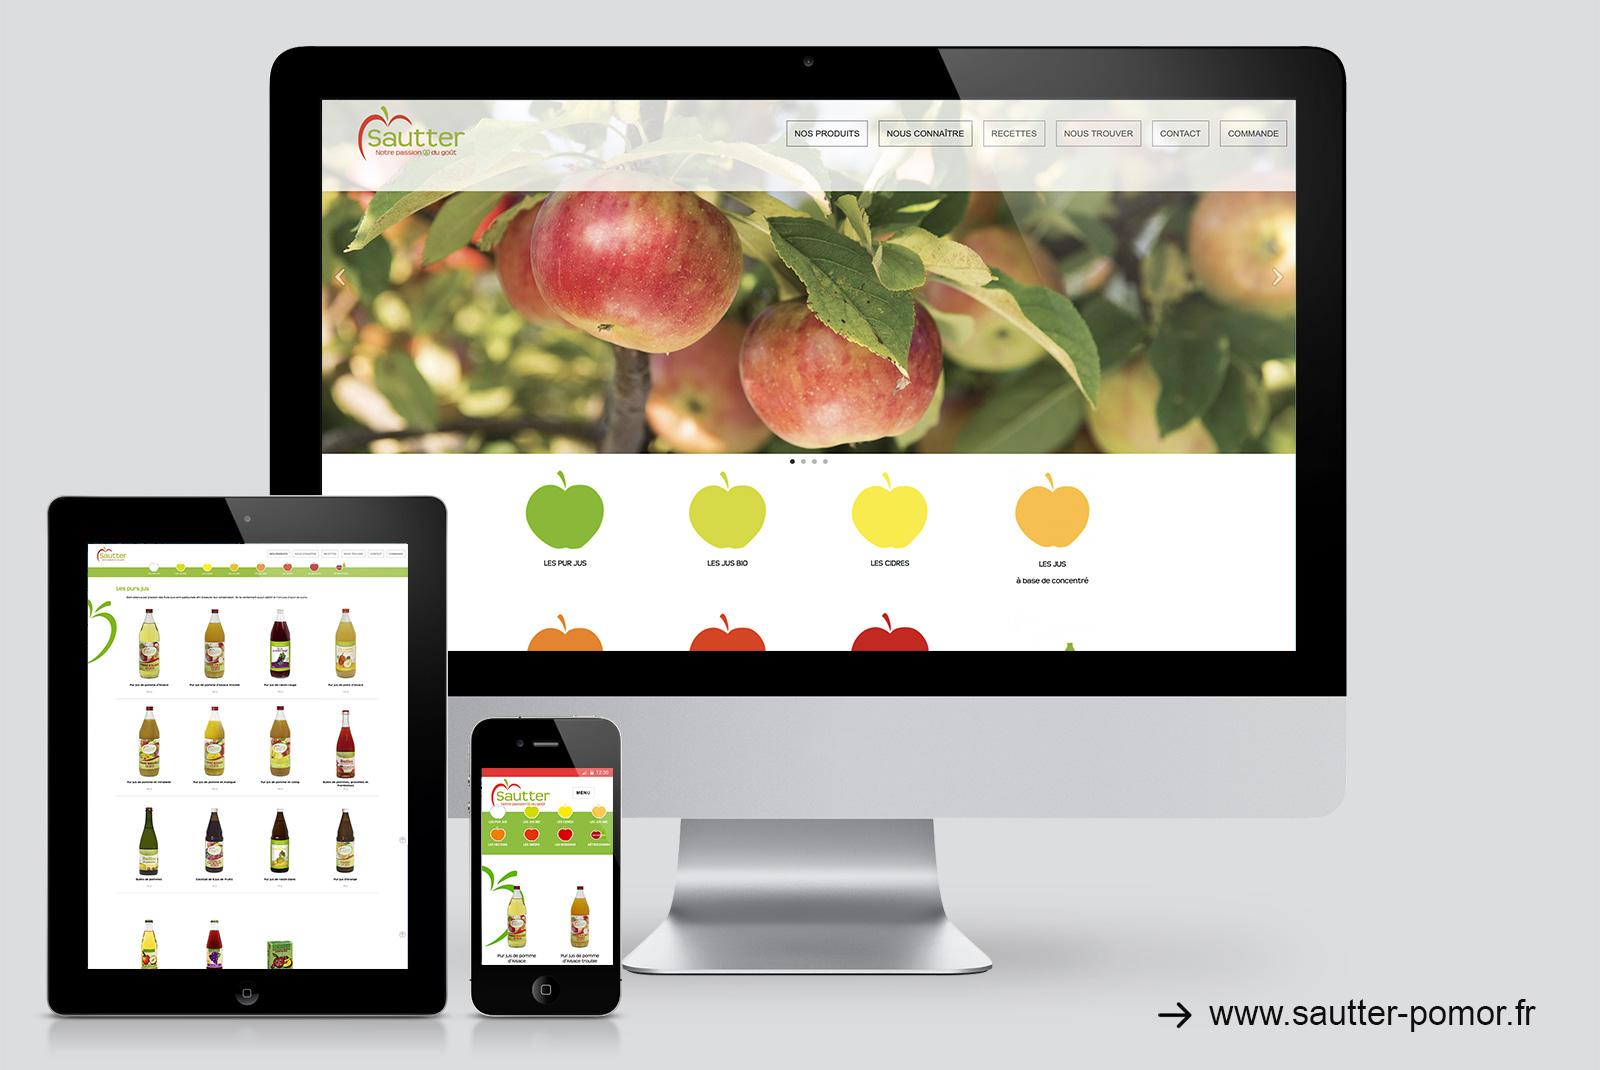 SAUTTER_WEB_ecran_ipad_iphone